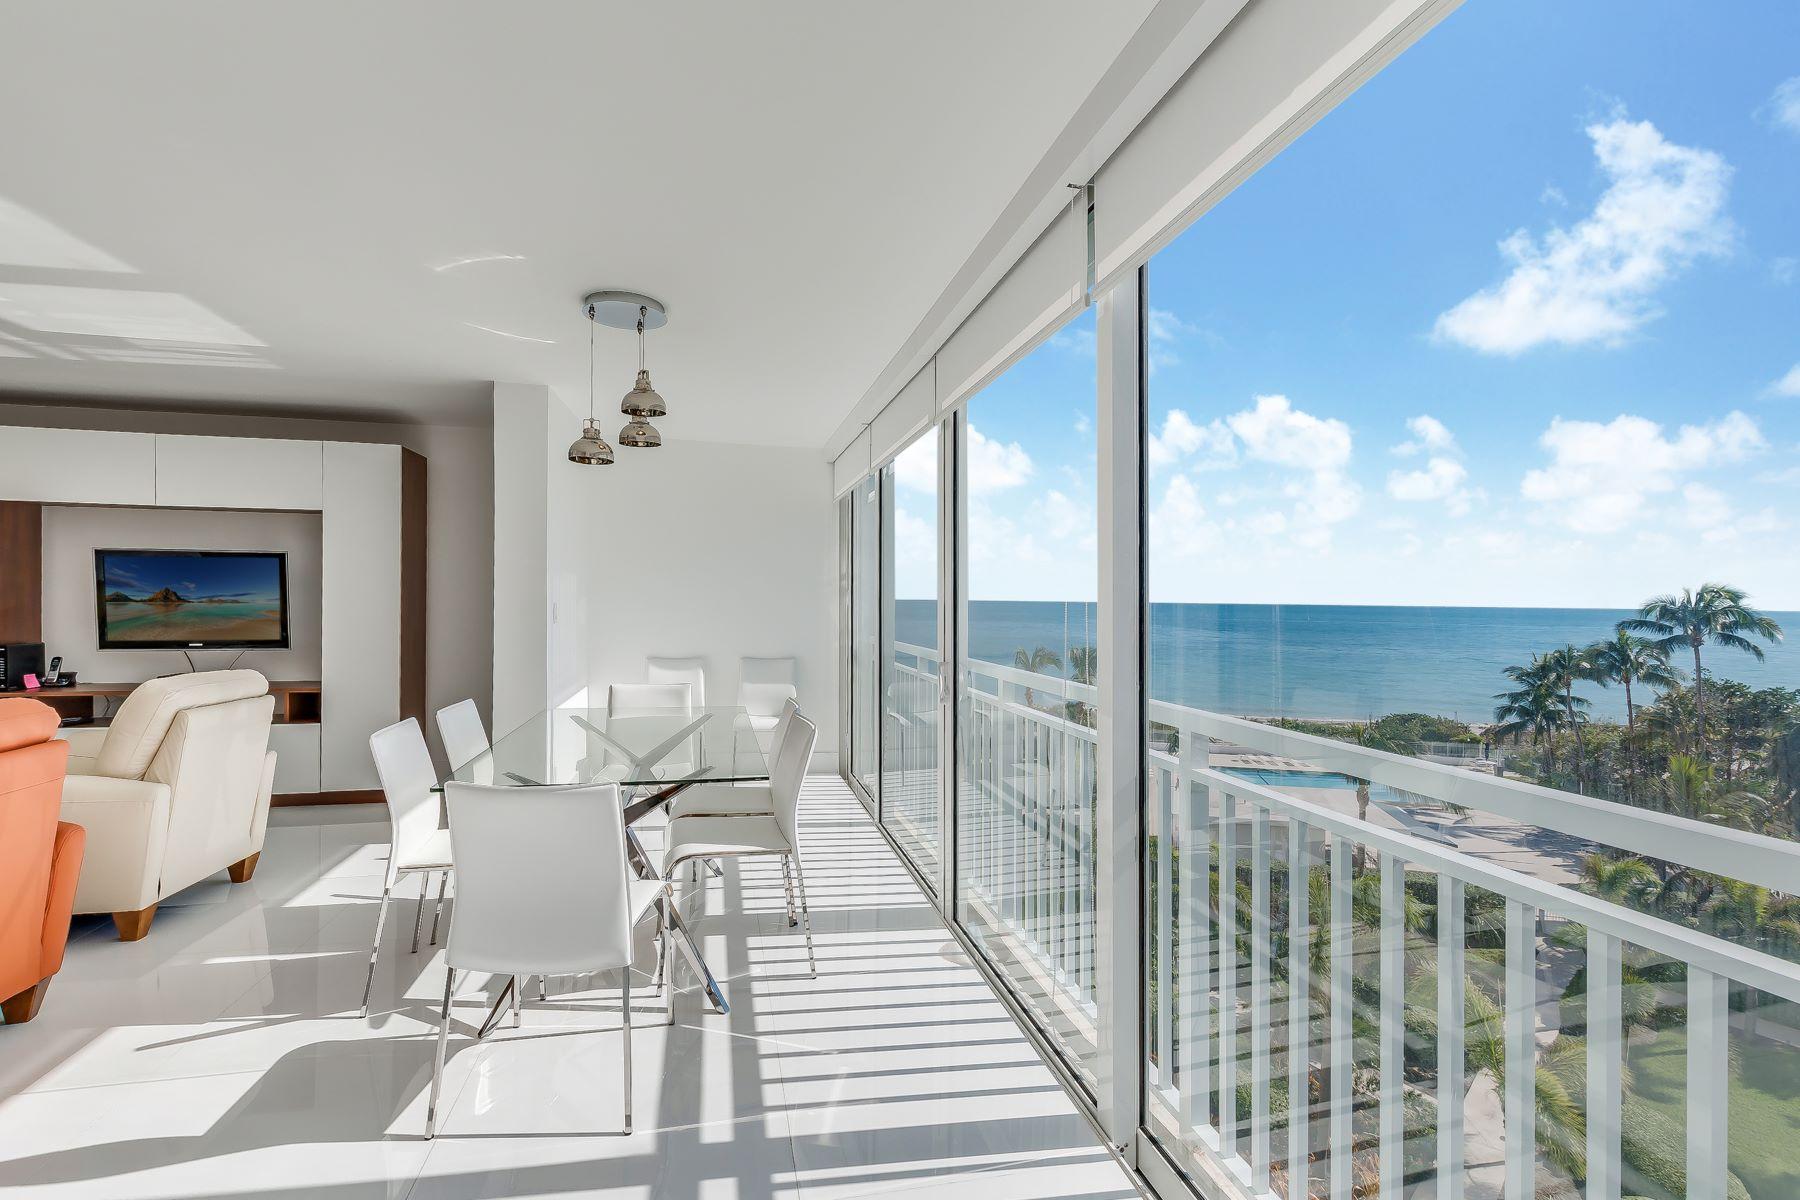 شقة بعمارة للـ Sale في 609 Ocean Drive 609 Ocean Drive 6G, Key Biscayne, Florida, 33149 United States